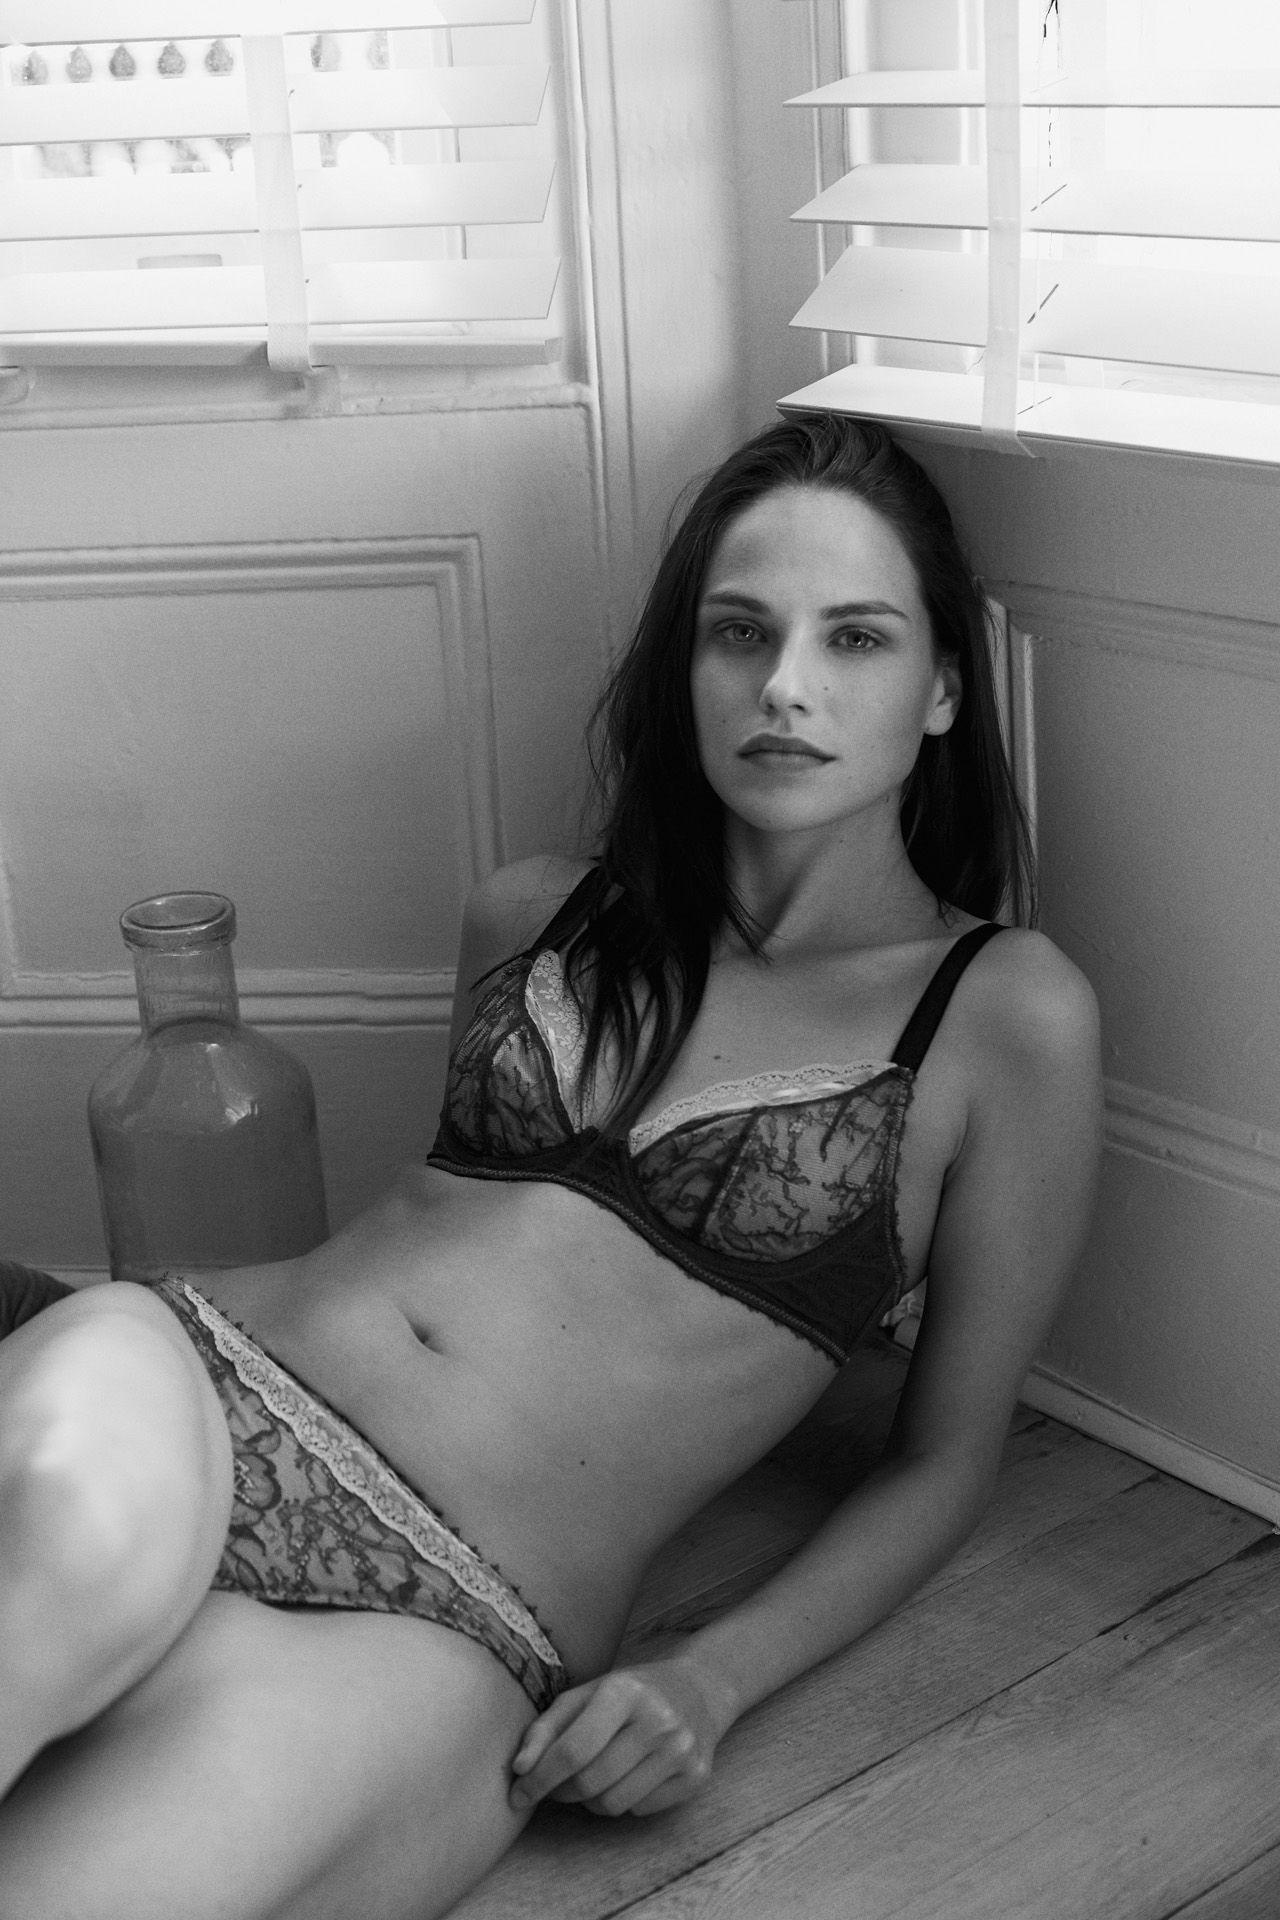 model Kat wearing Iris London lingerie by Maxyme G Delisle